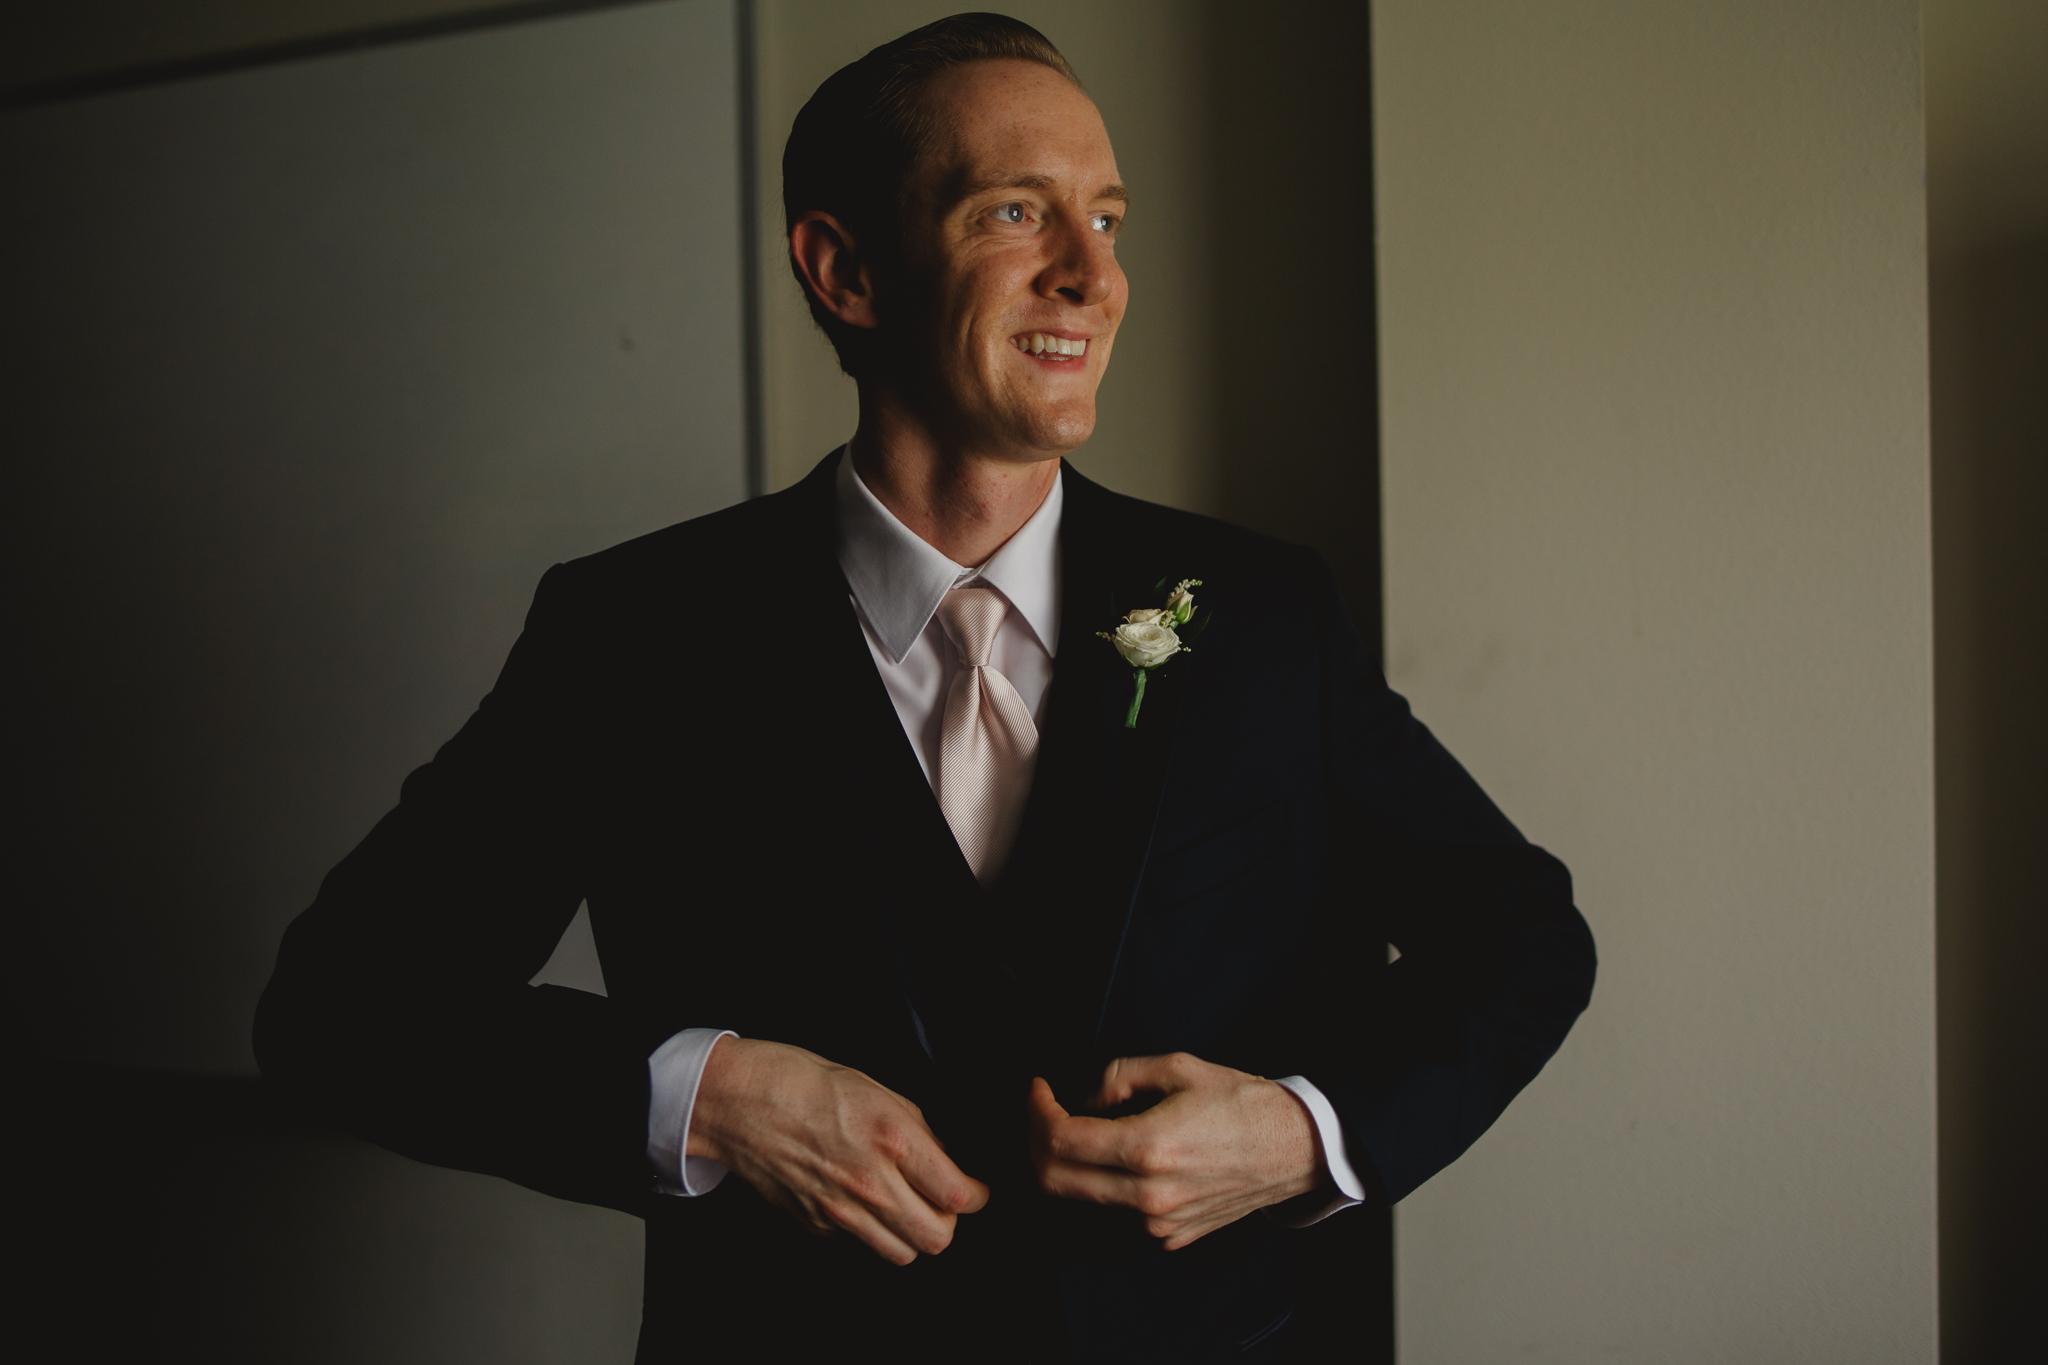 Michael and Kelly - the ashton depot - wedding DFW - wedding photographer- elizalde photography (11 of 150).jpg